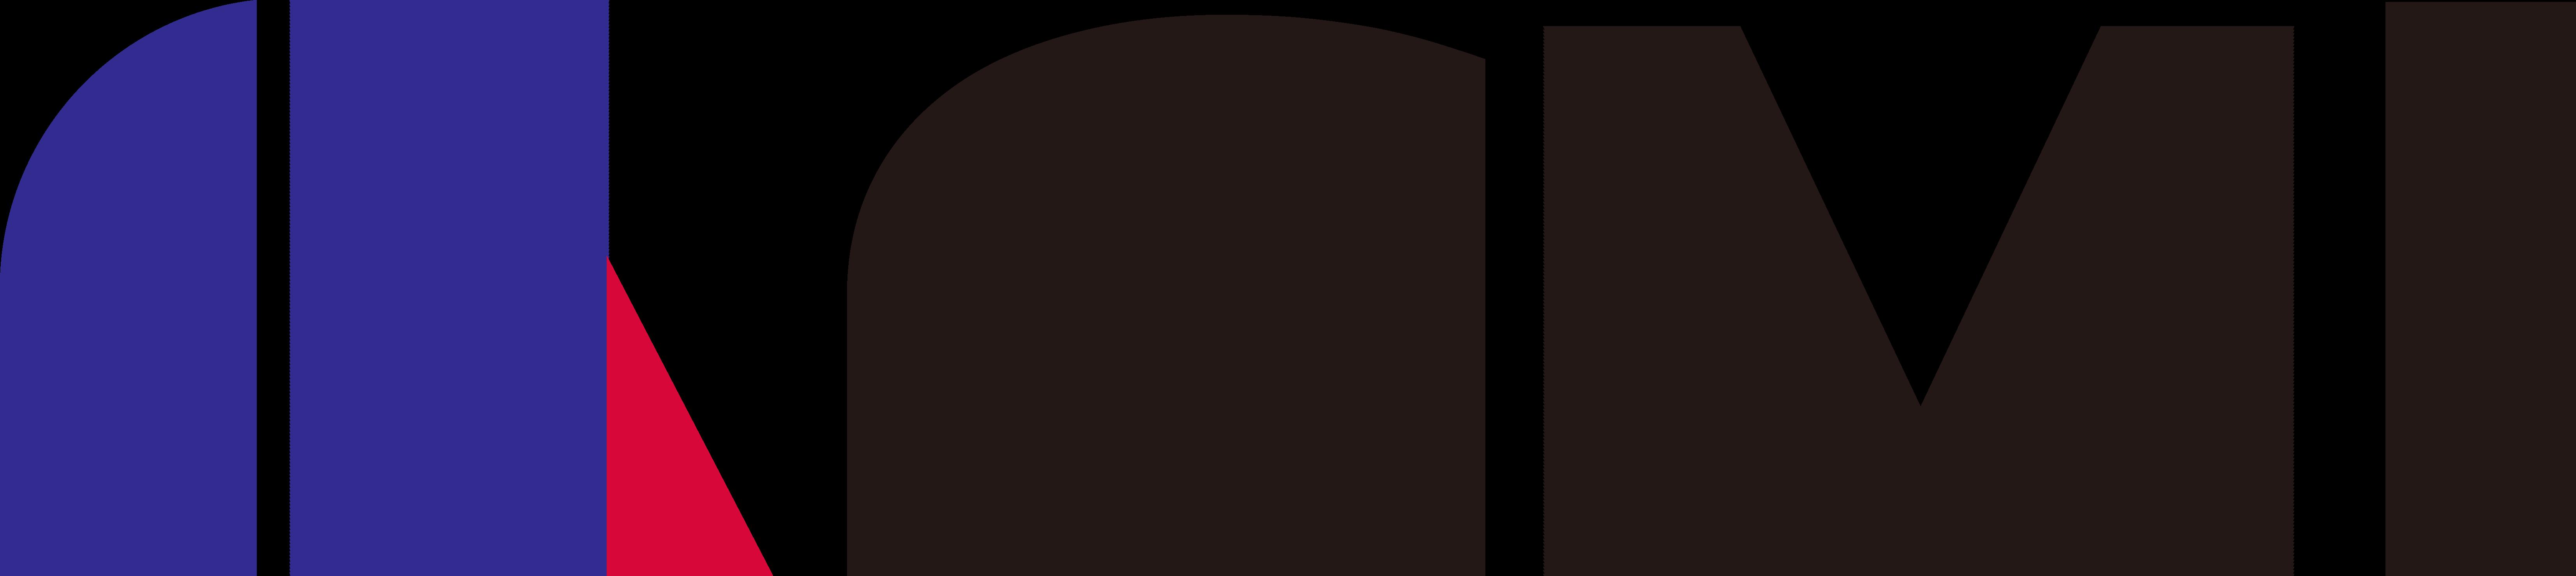 CViのSaaSアプリケーションシリーズ AttendancePro